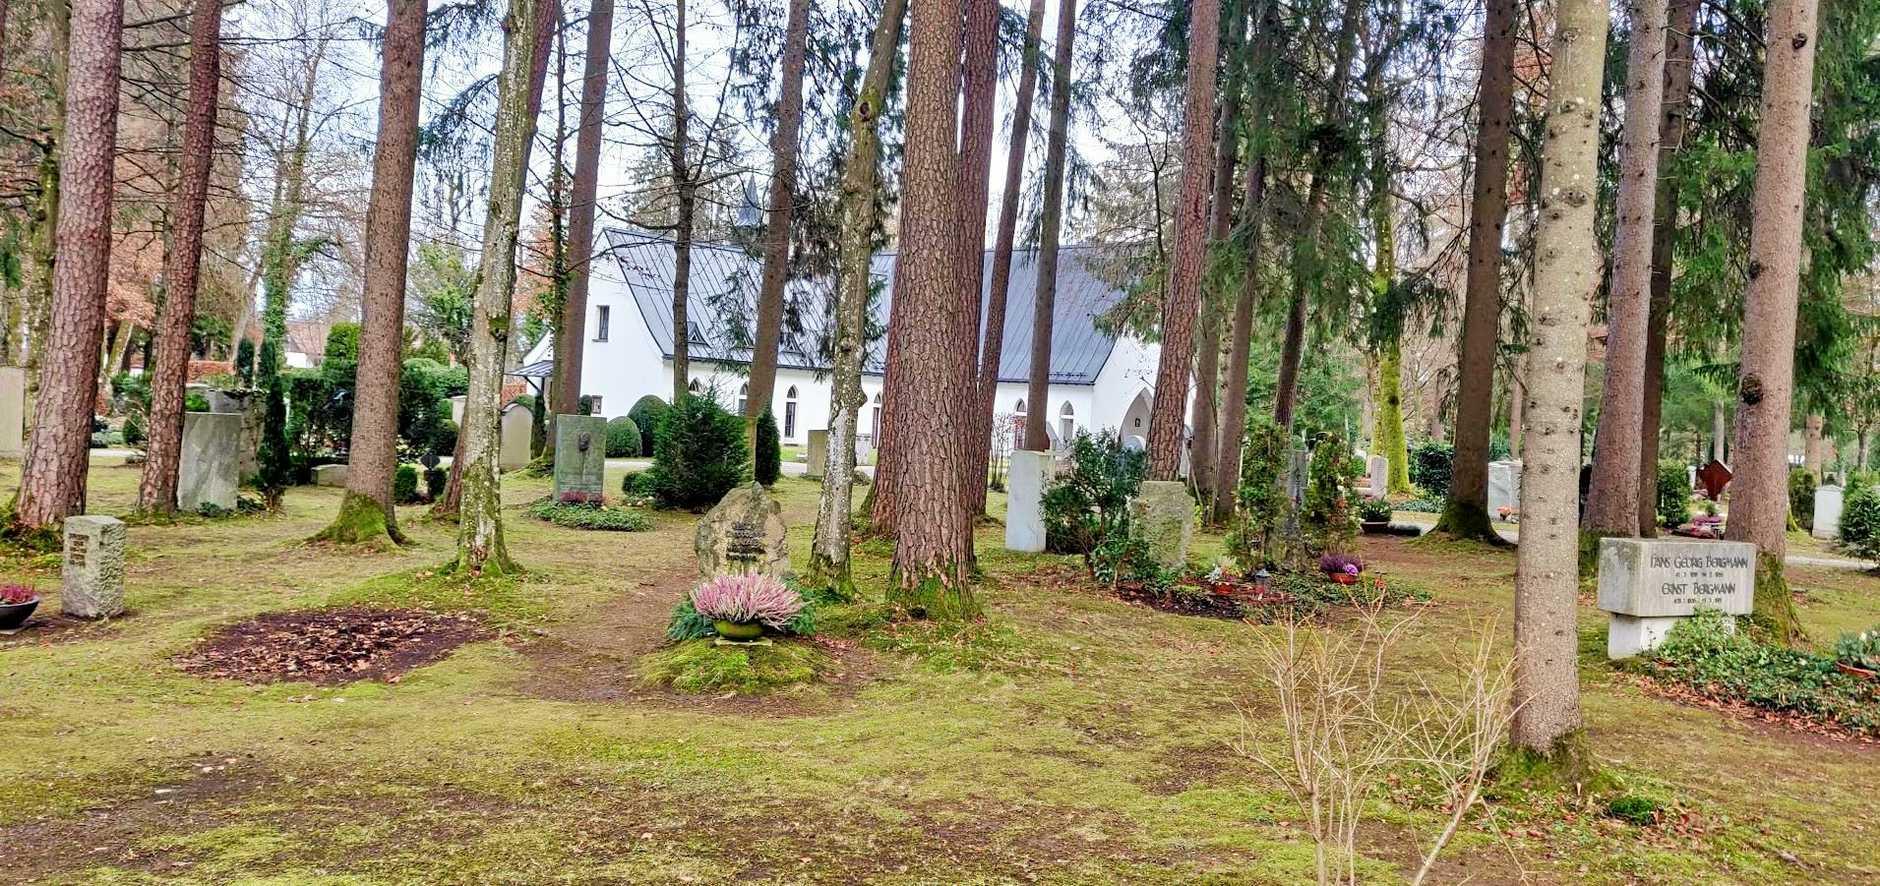 The cemetery in Grunwald.